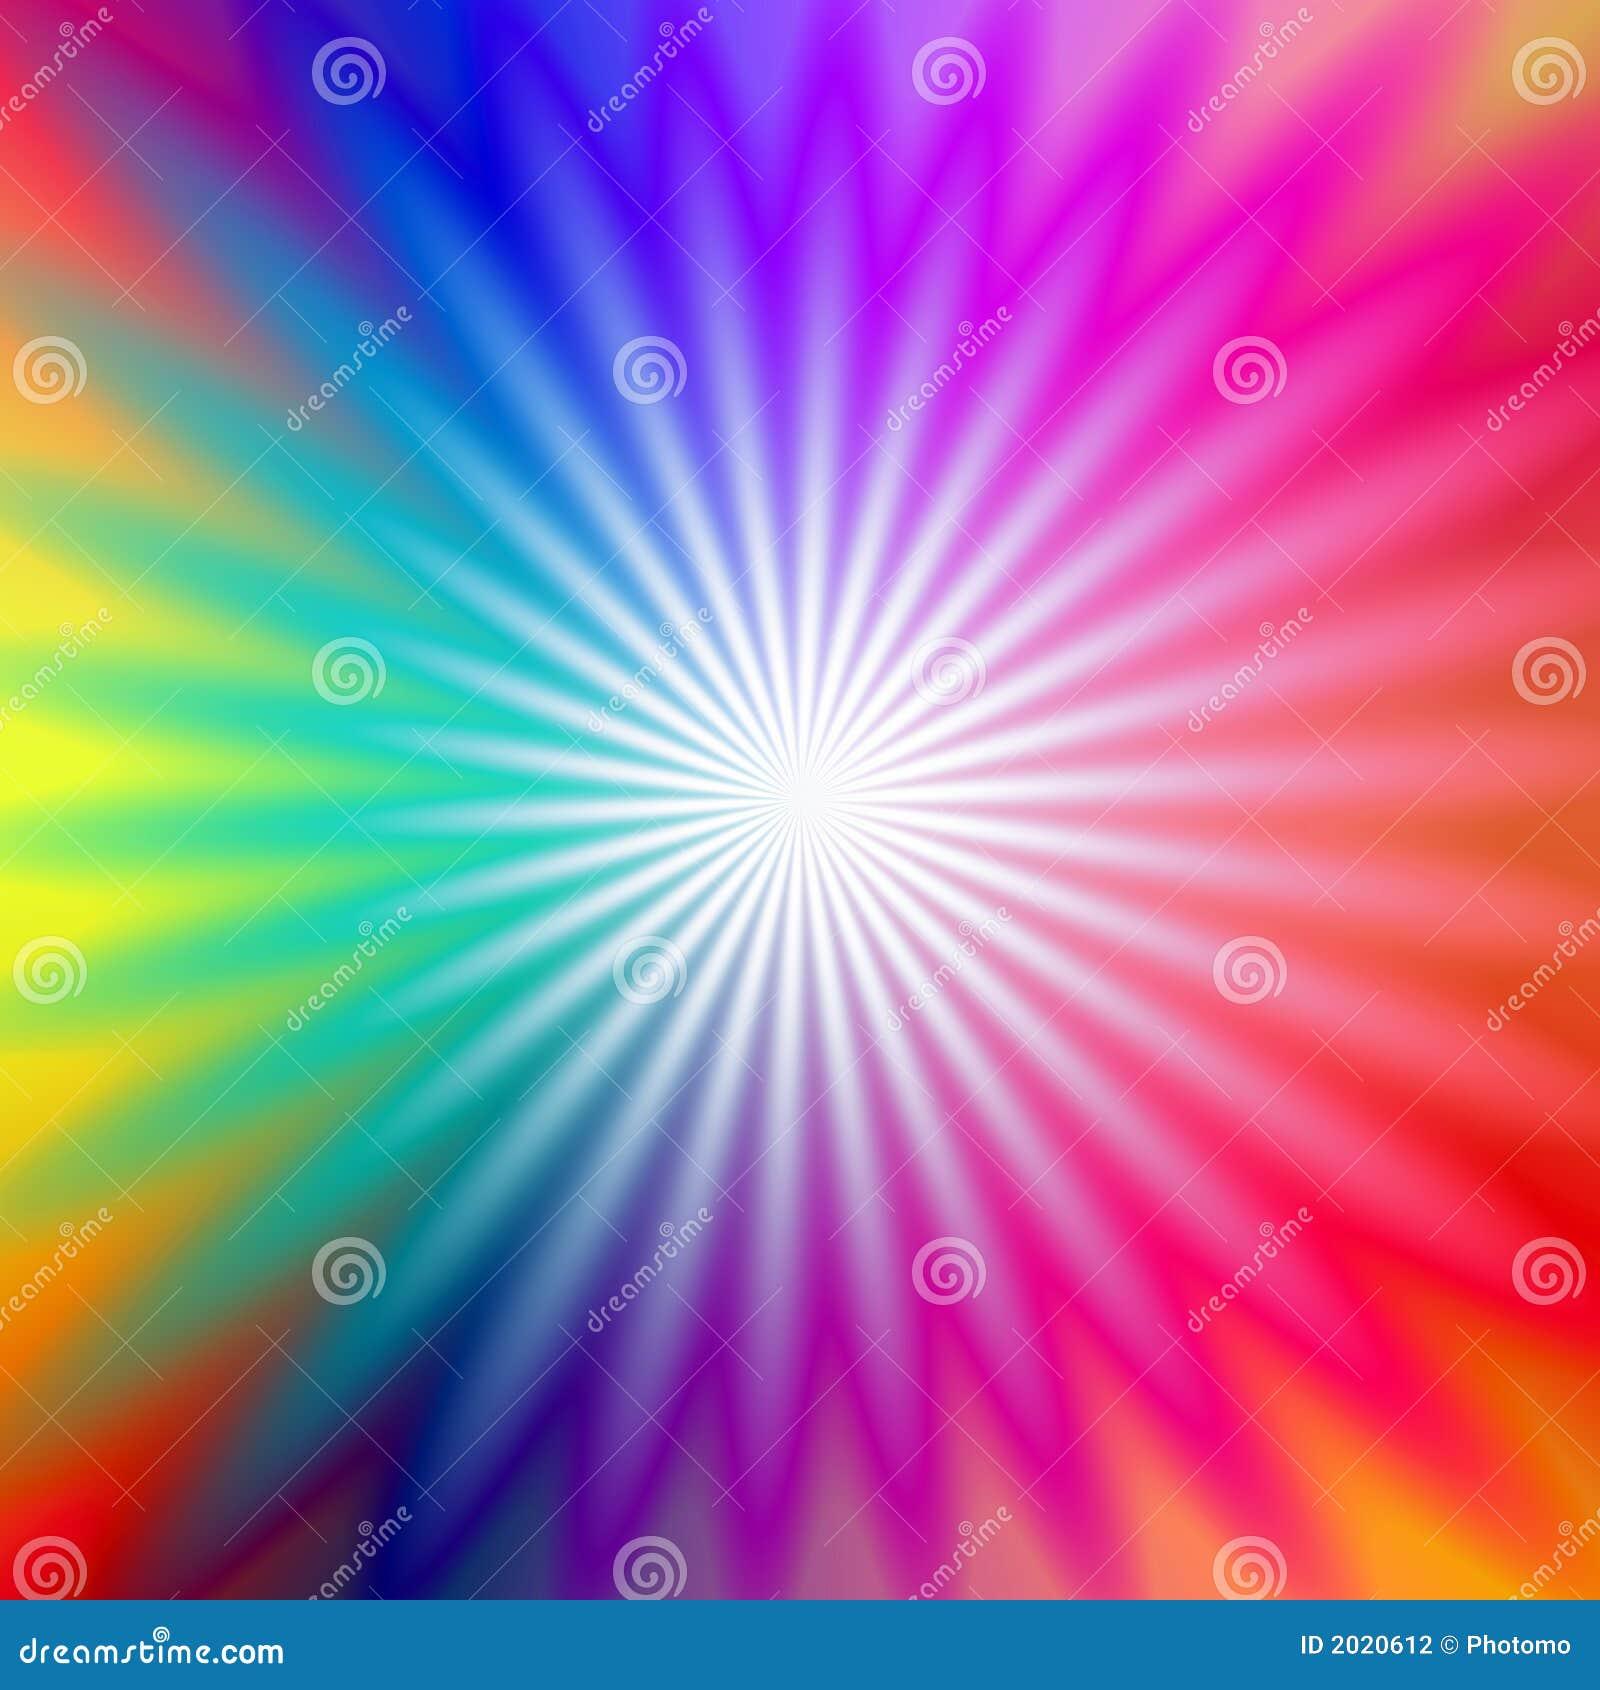 Rainbow Radial Glow Stock Photography - Image: 2020612